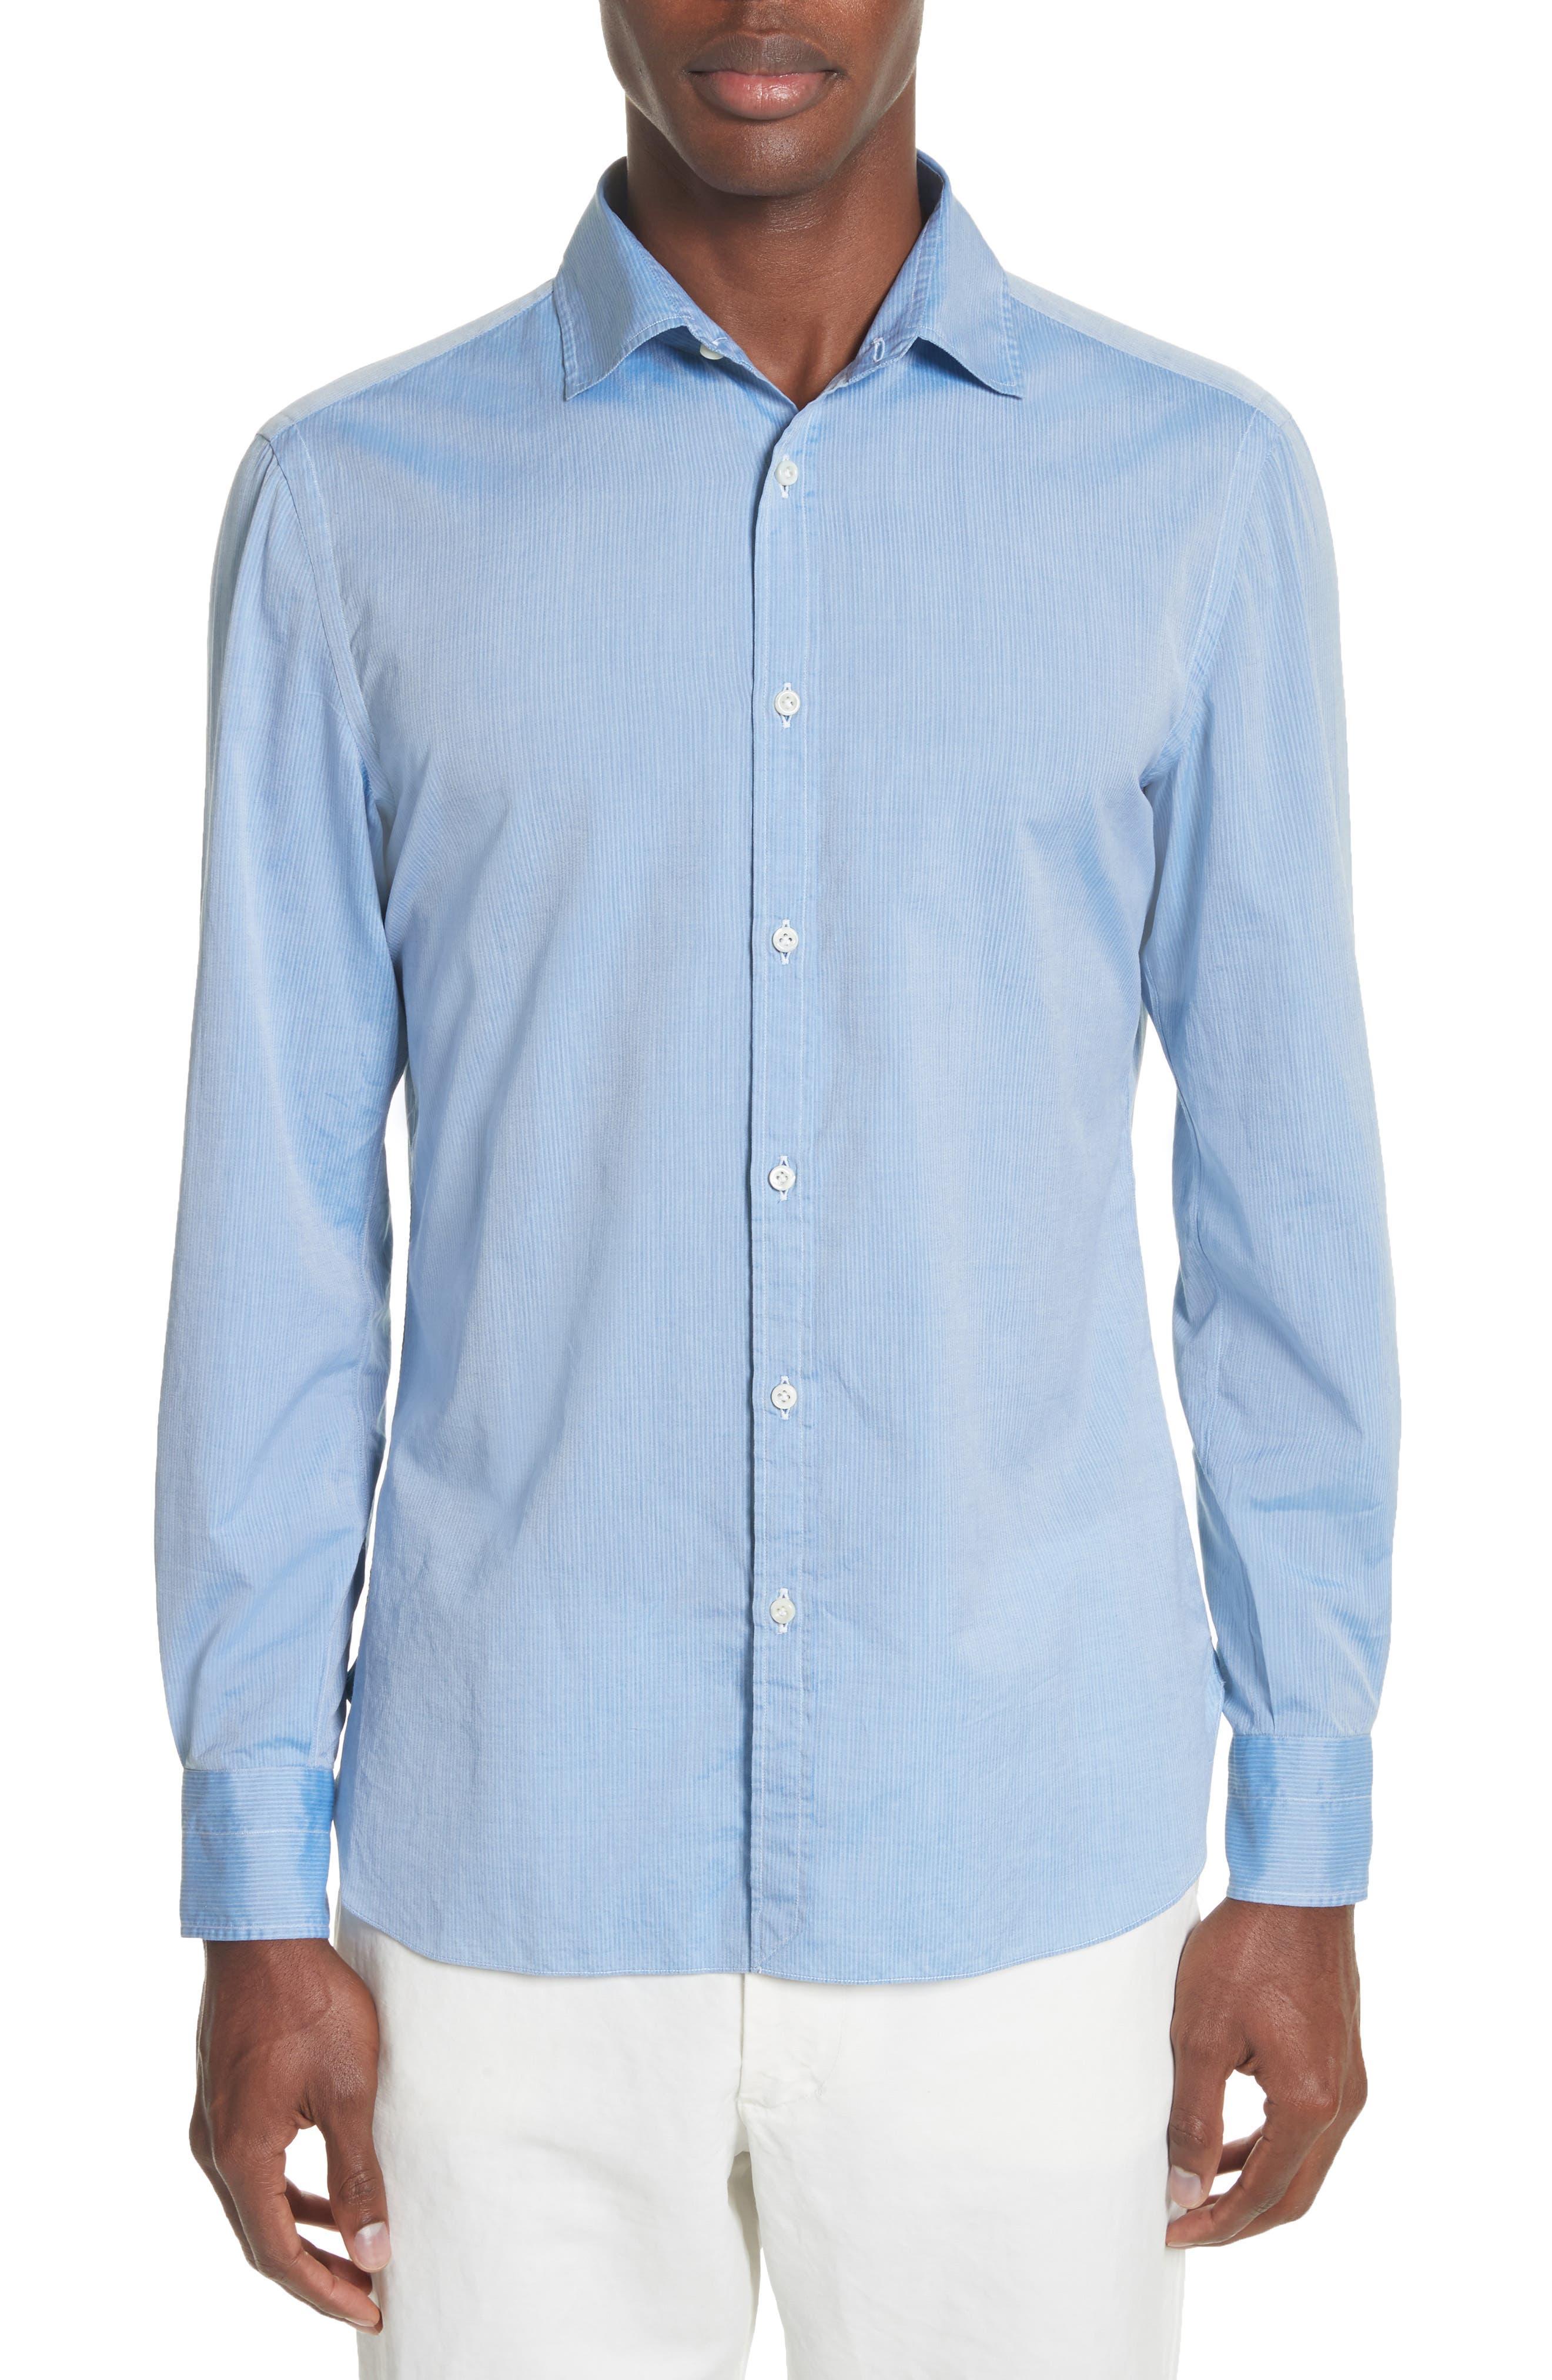 Napoli JB Washed Stripe Sport Shirt,                         Main,                         color, 400